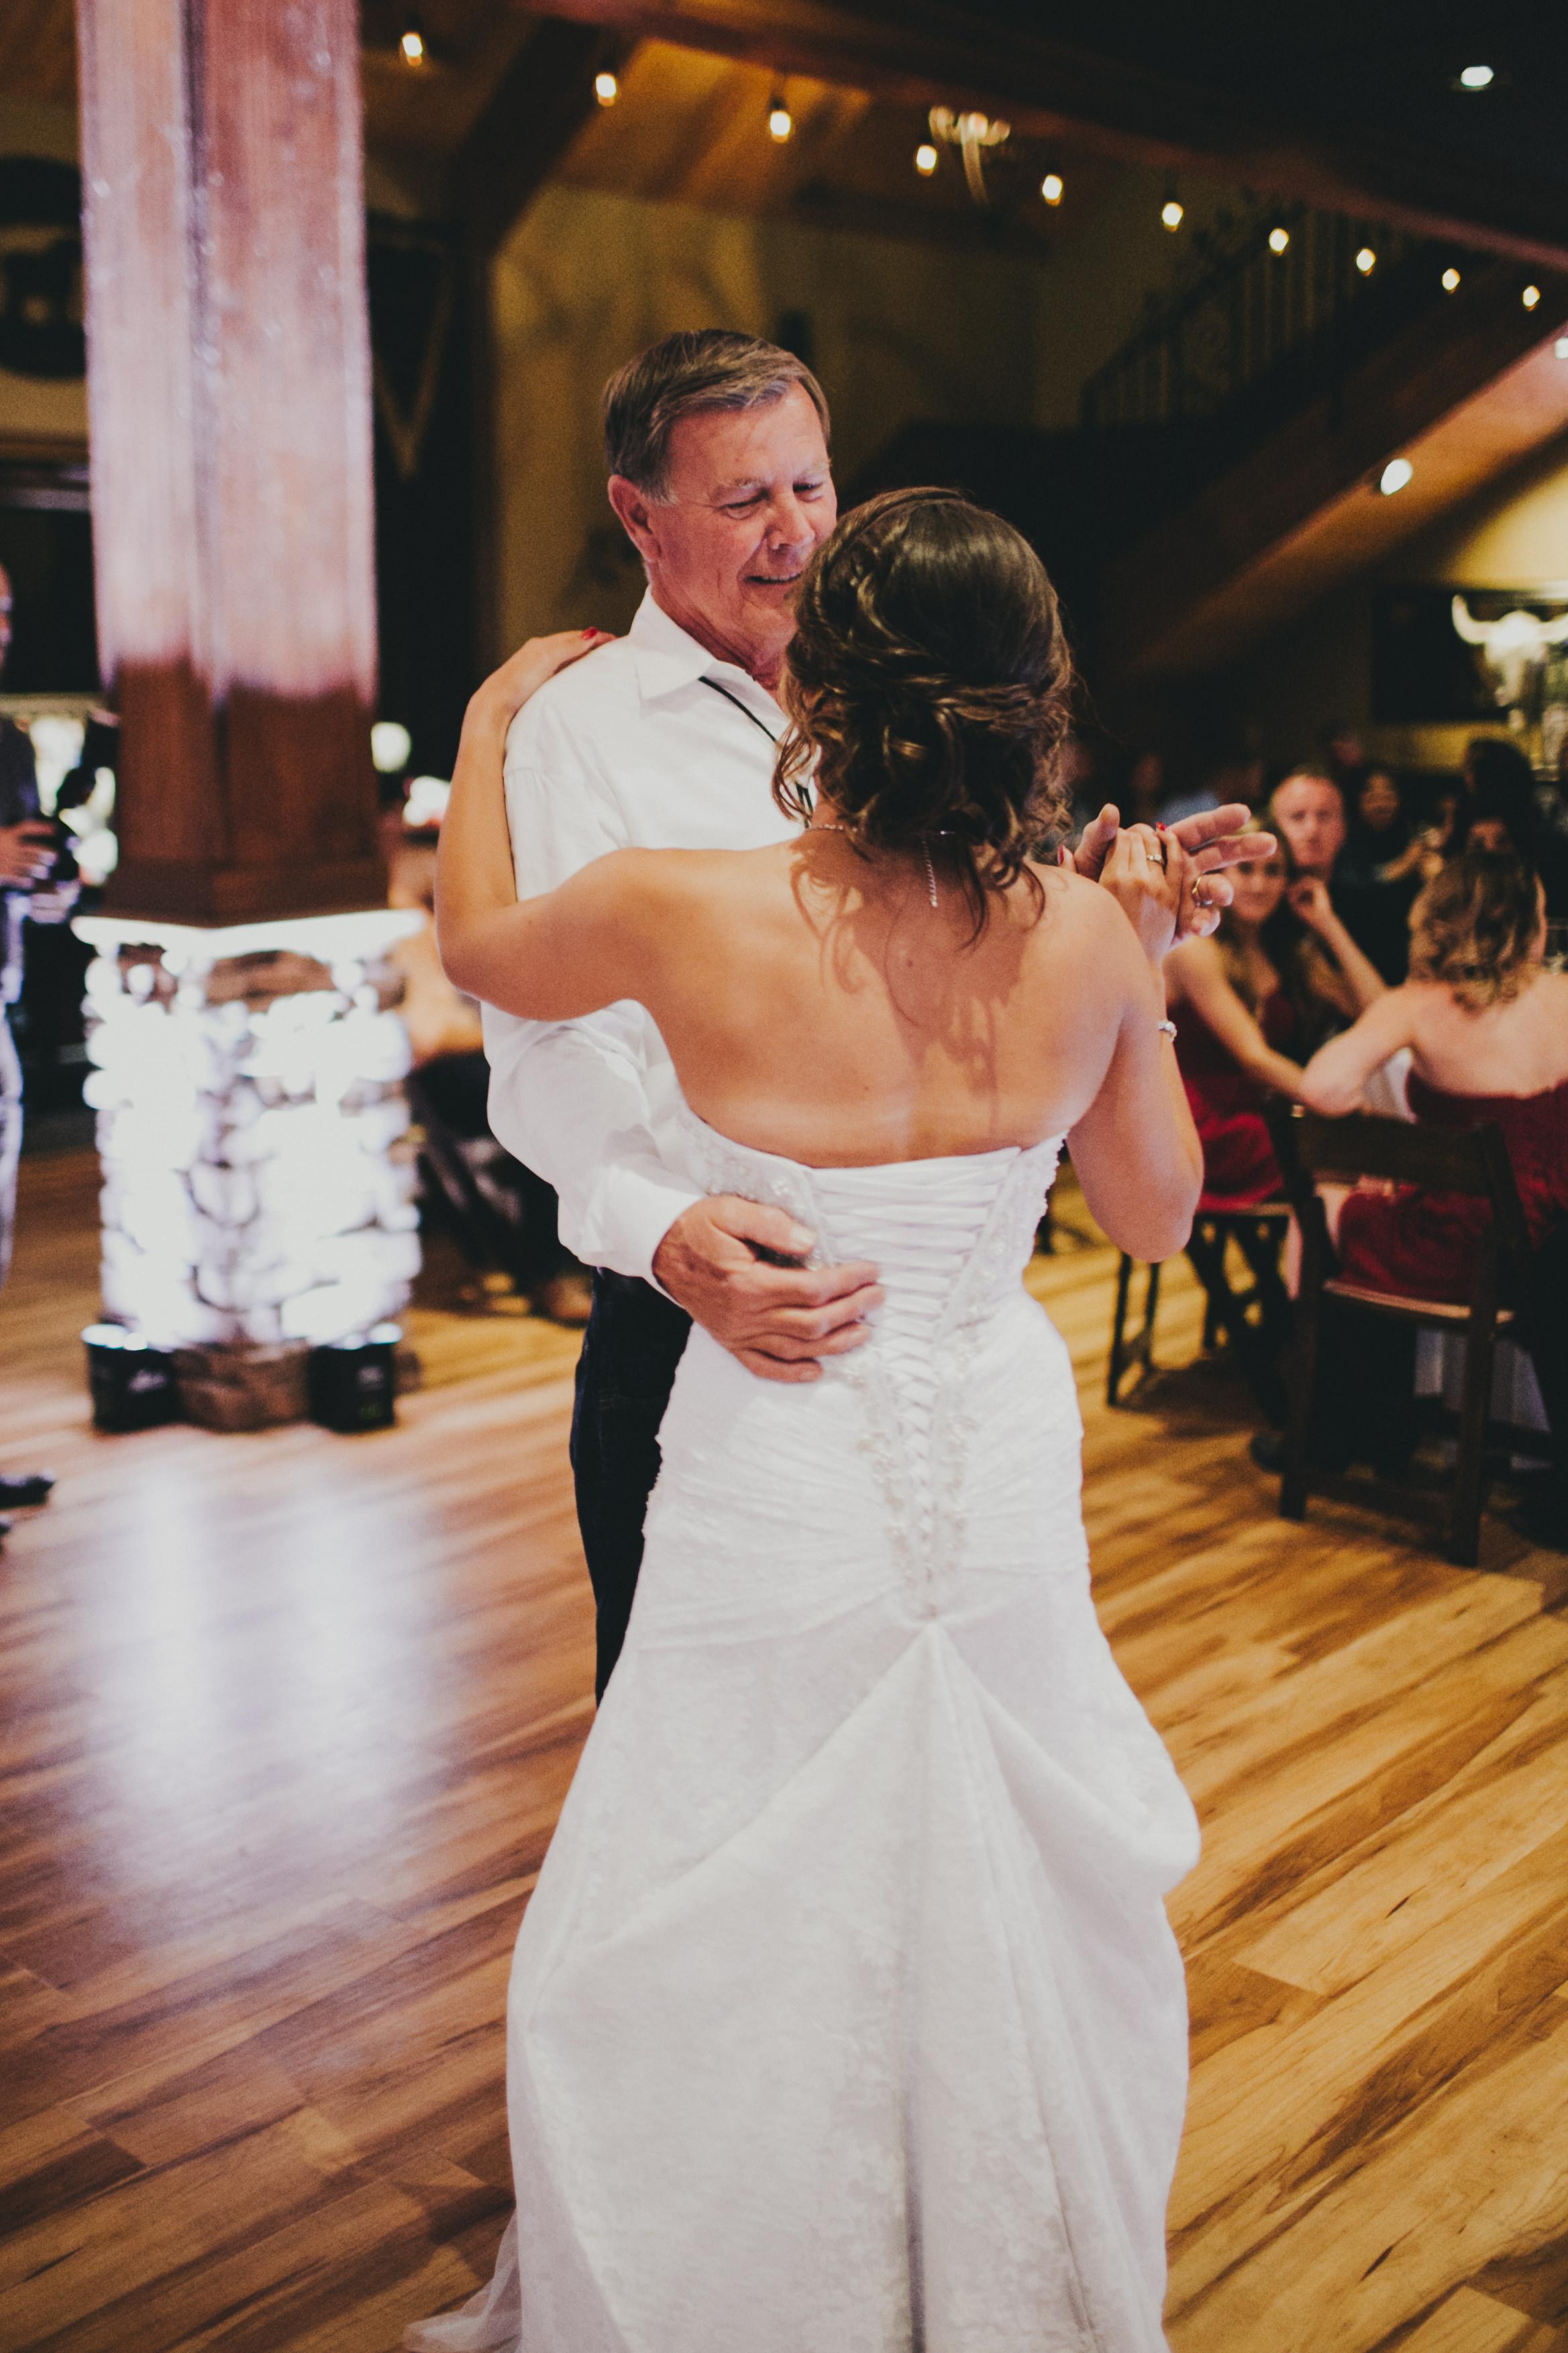 Cheyenne + Jordan - Wedding, Natalie Griffo (118 of 157).jpg